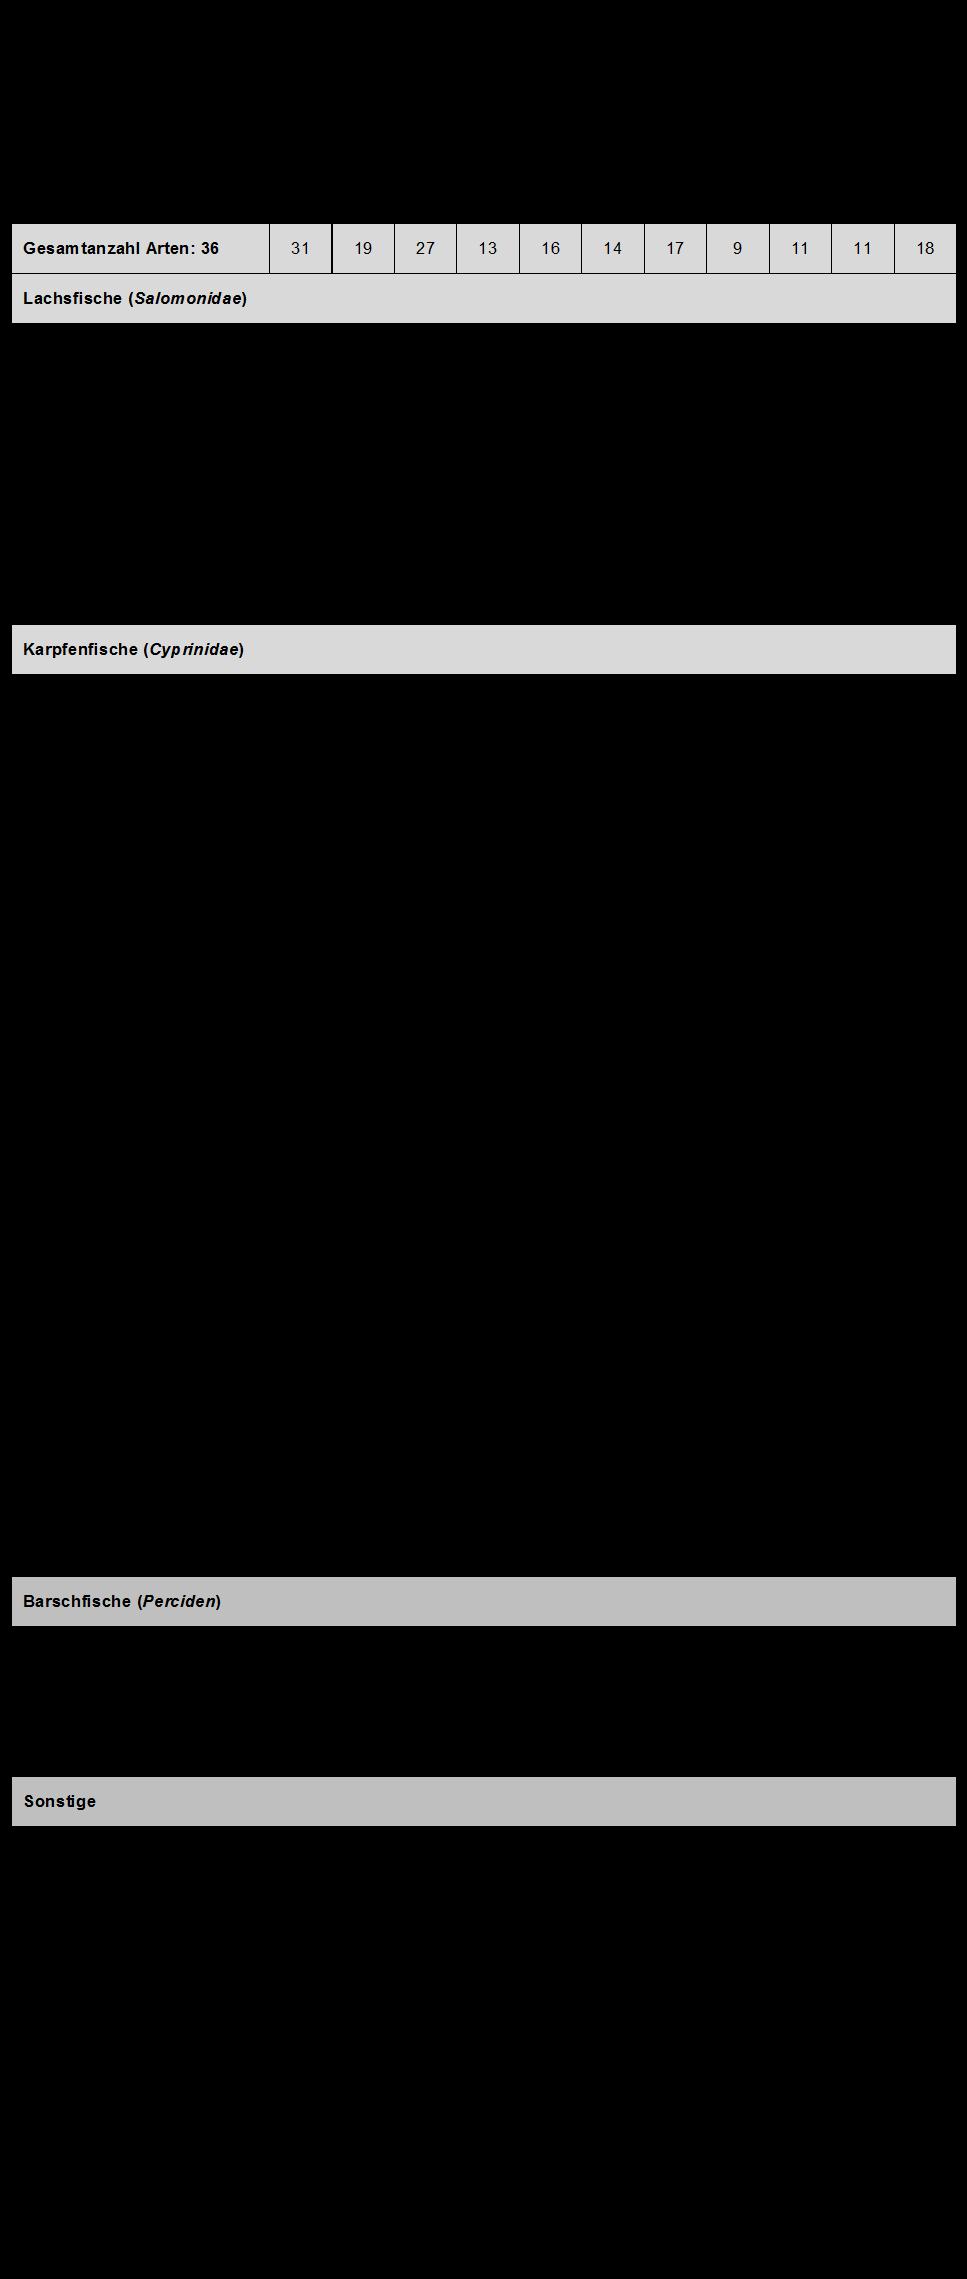 tabelle-fischarten-vereinsgewaesser